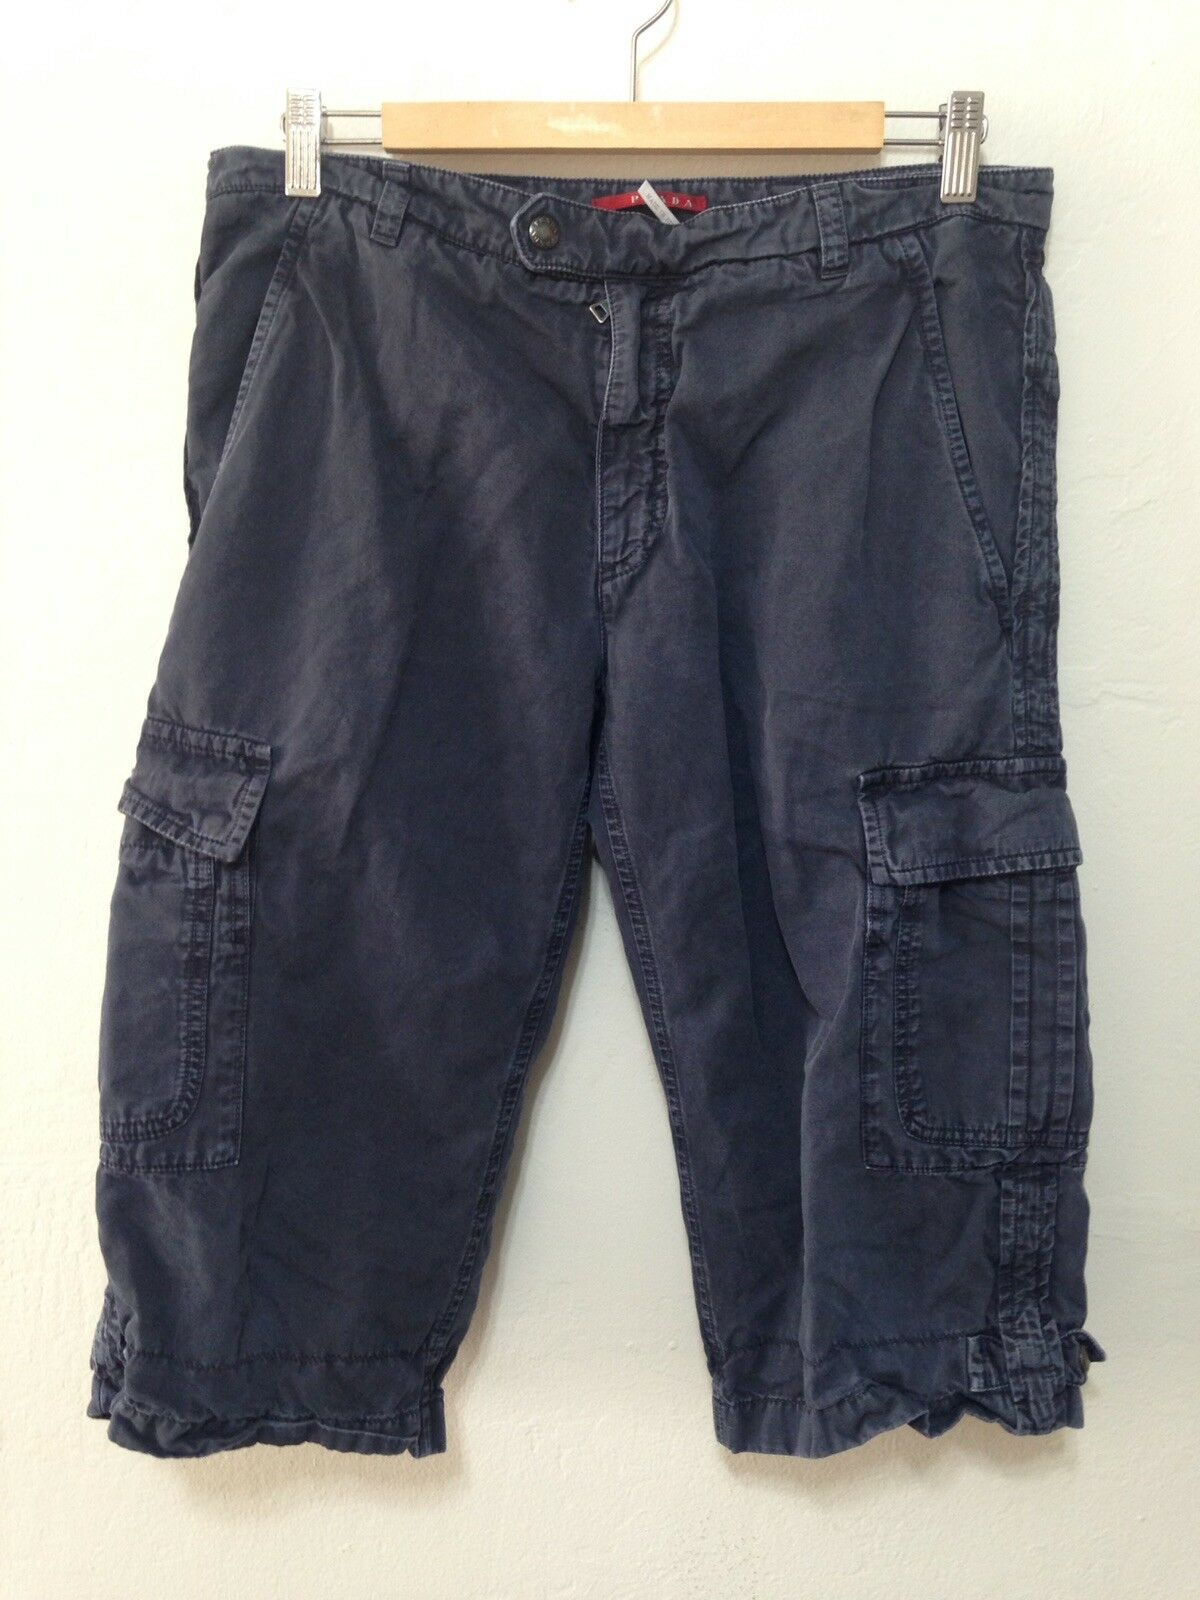 G448 Women's Prada Cotton Linen Blend Cargo Shorts Charcoal Size 32